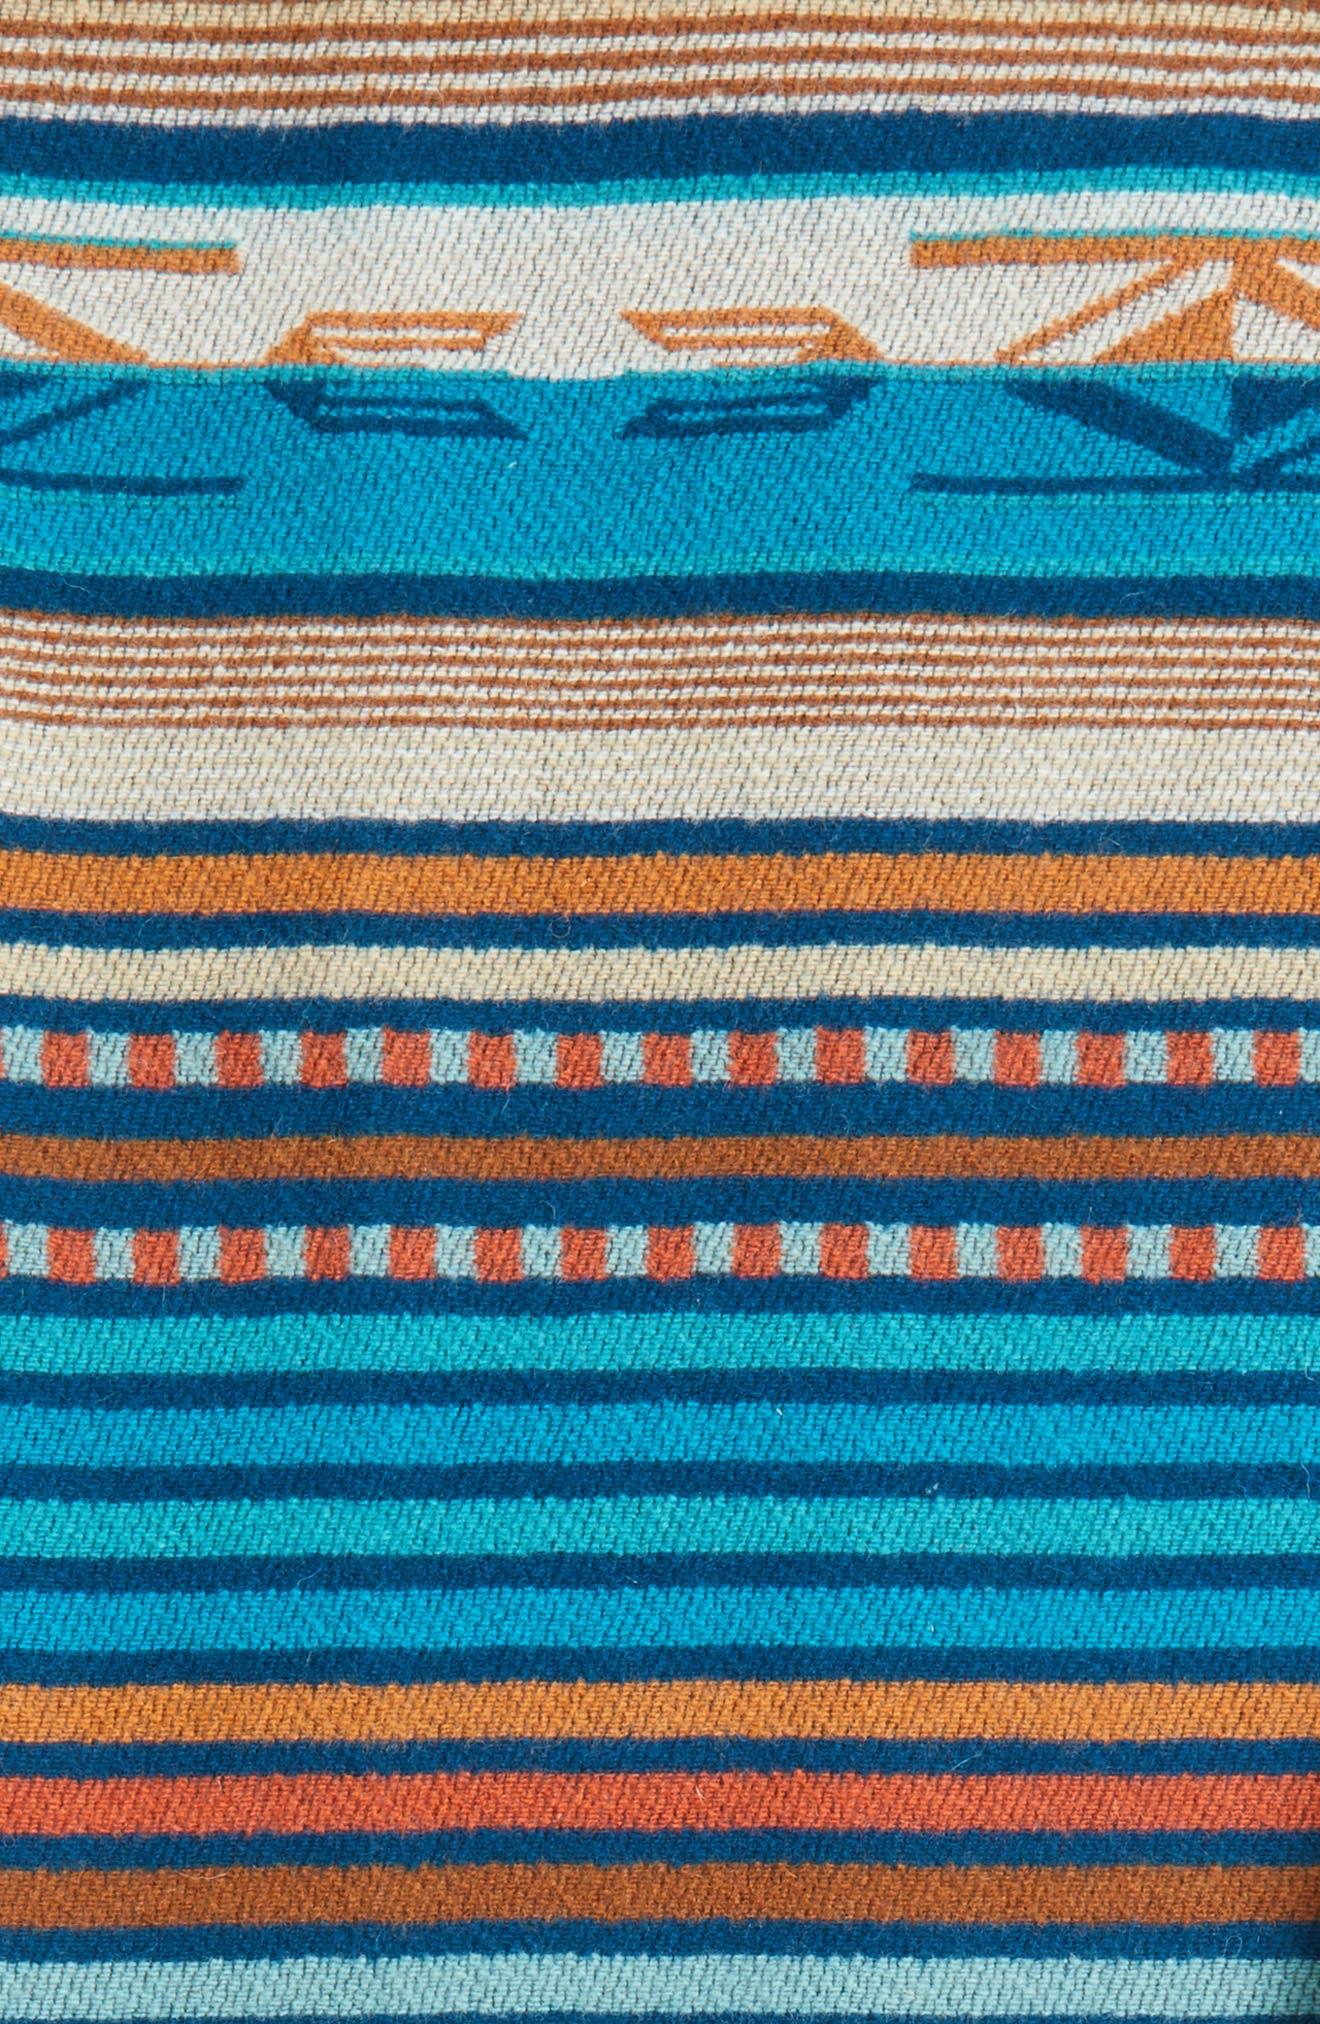 'Chimayo' Fringe Wool Throw,                             Alternate thumbnail 3, color,                             Turquoise